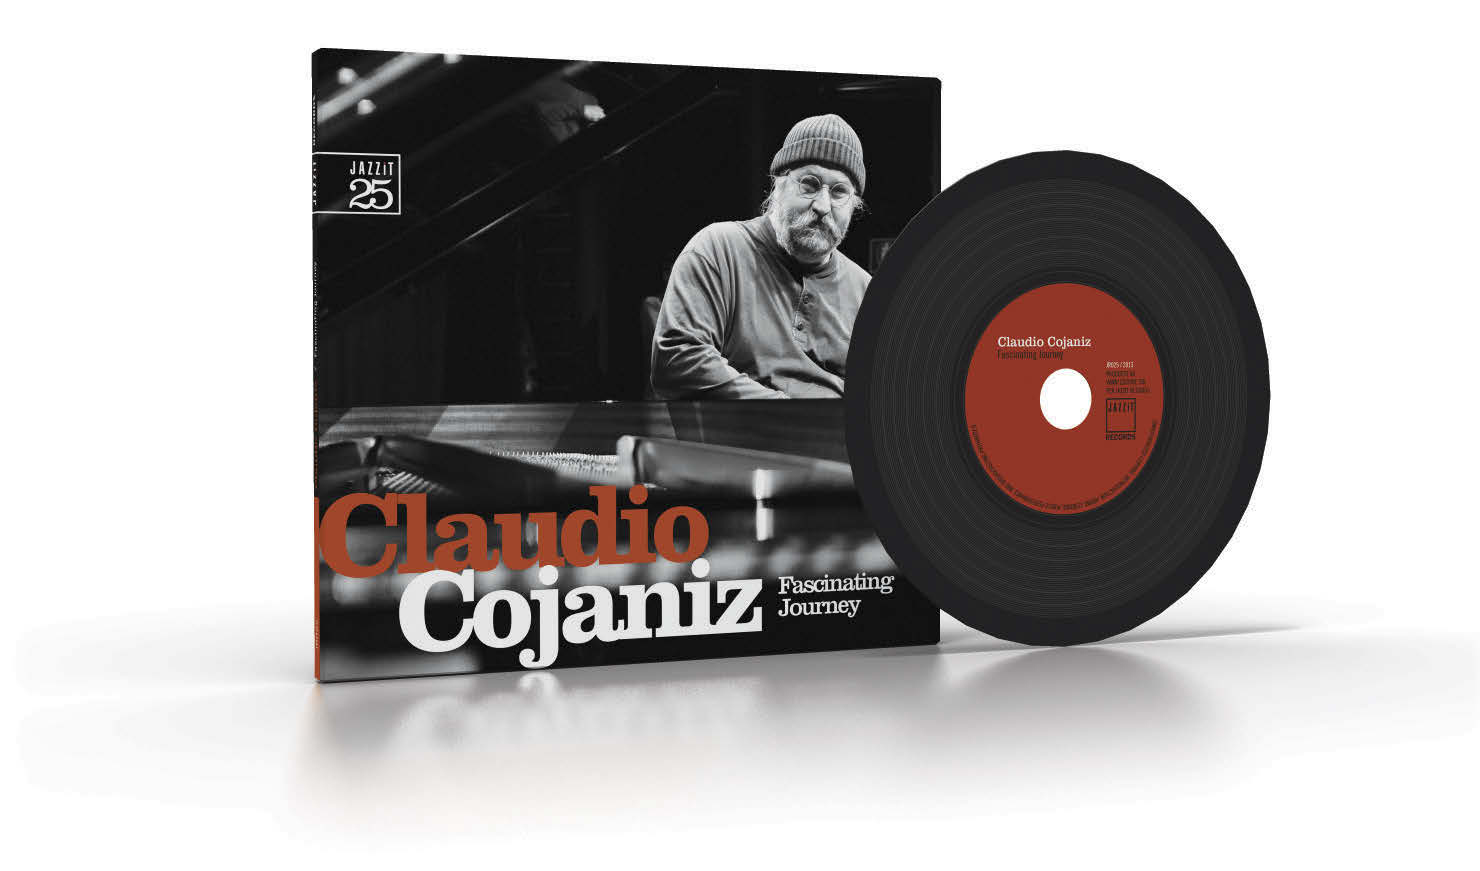 Claudio Cojaniz albumFascinating Journey